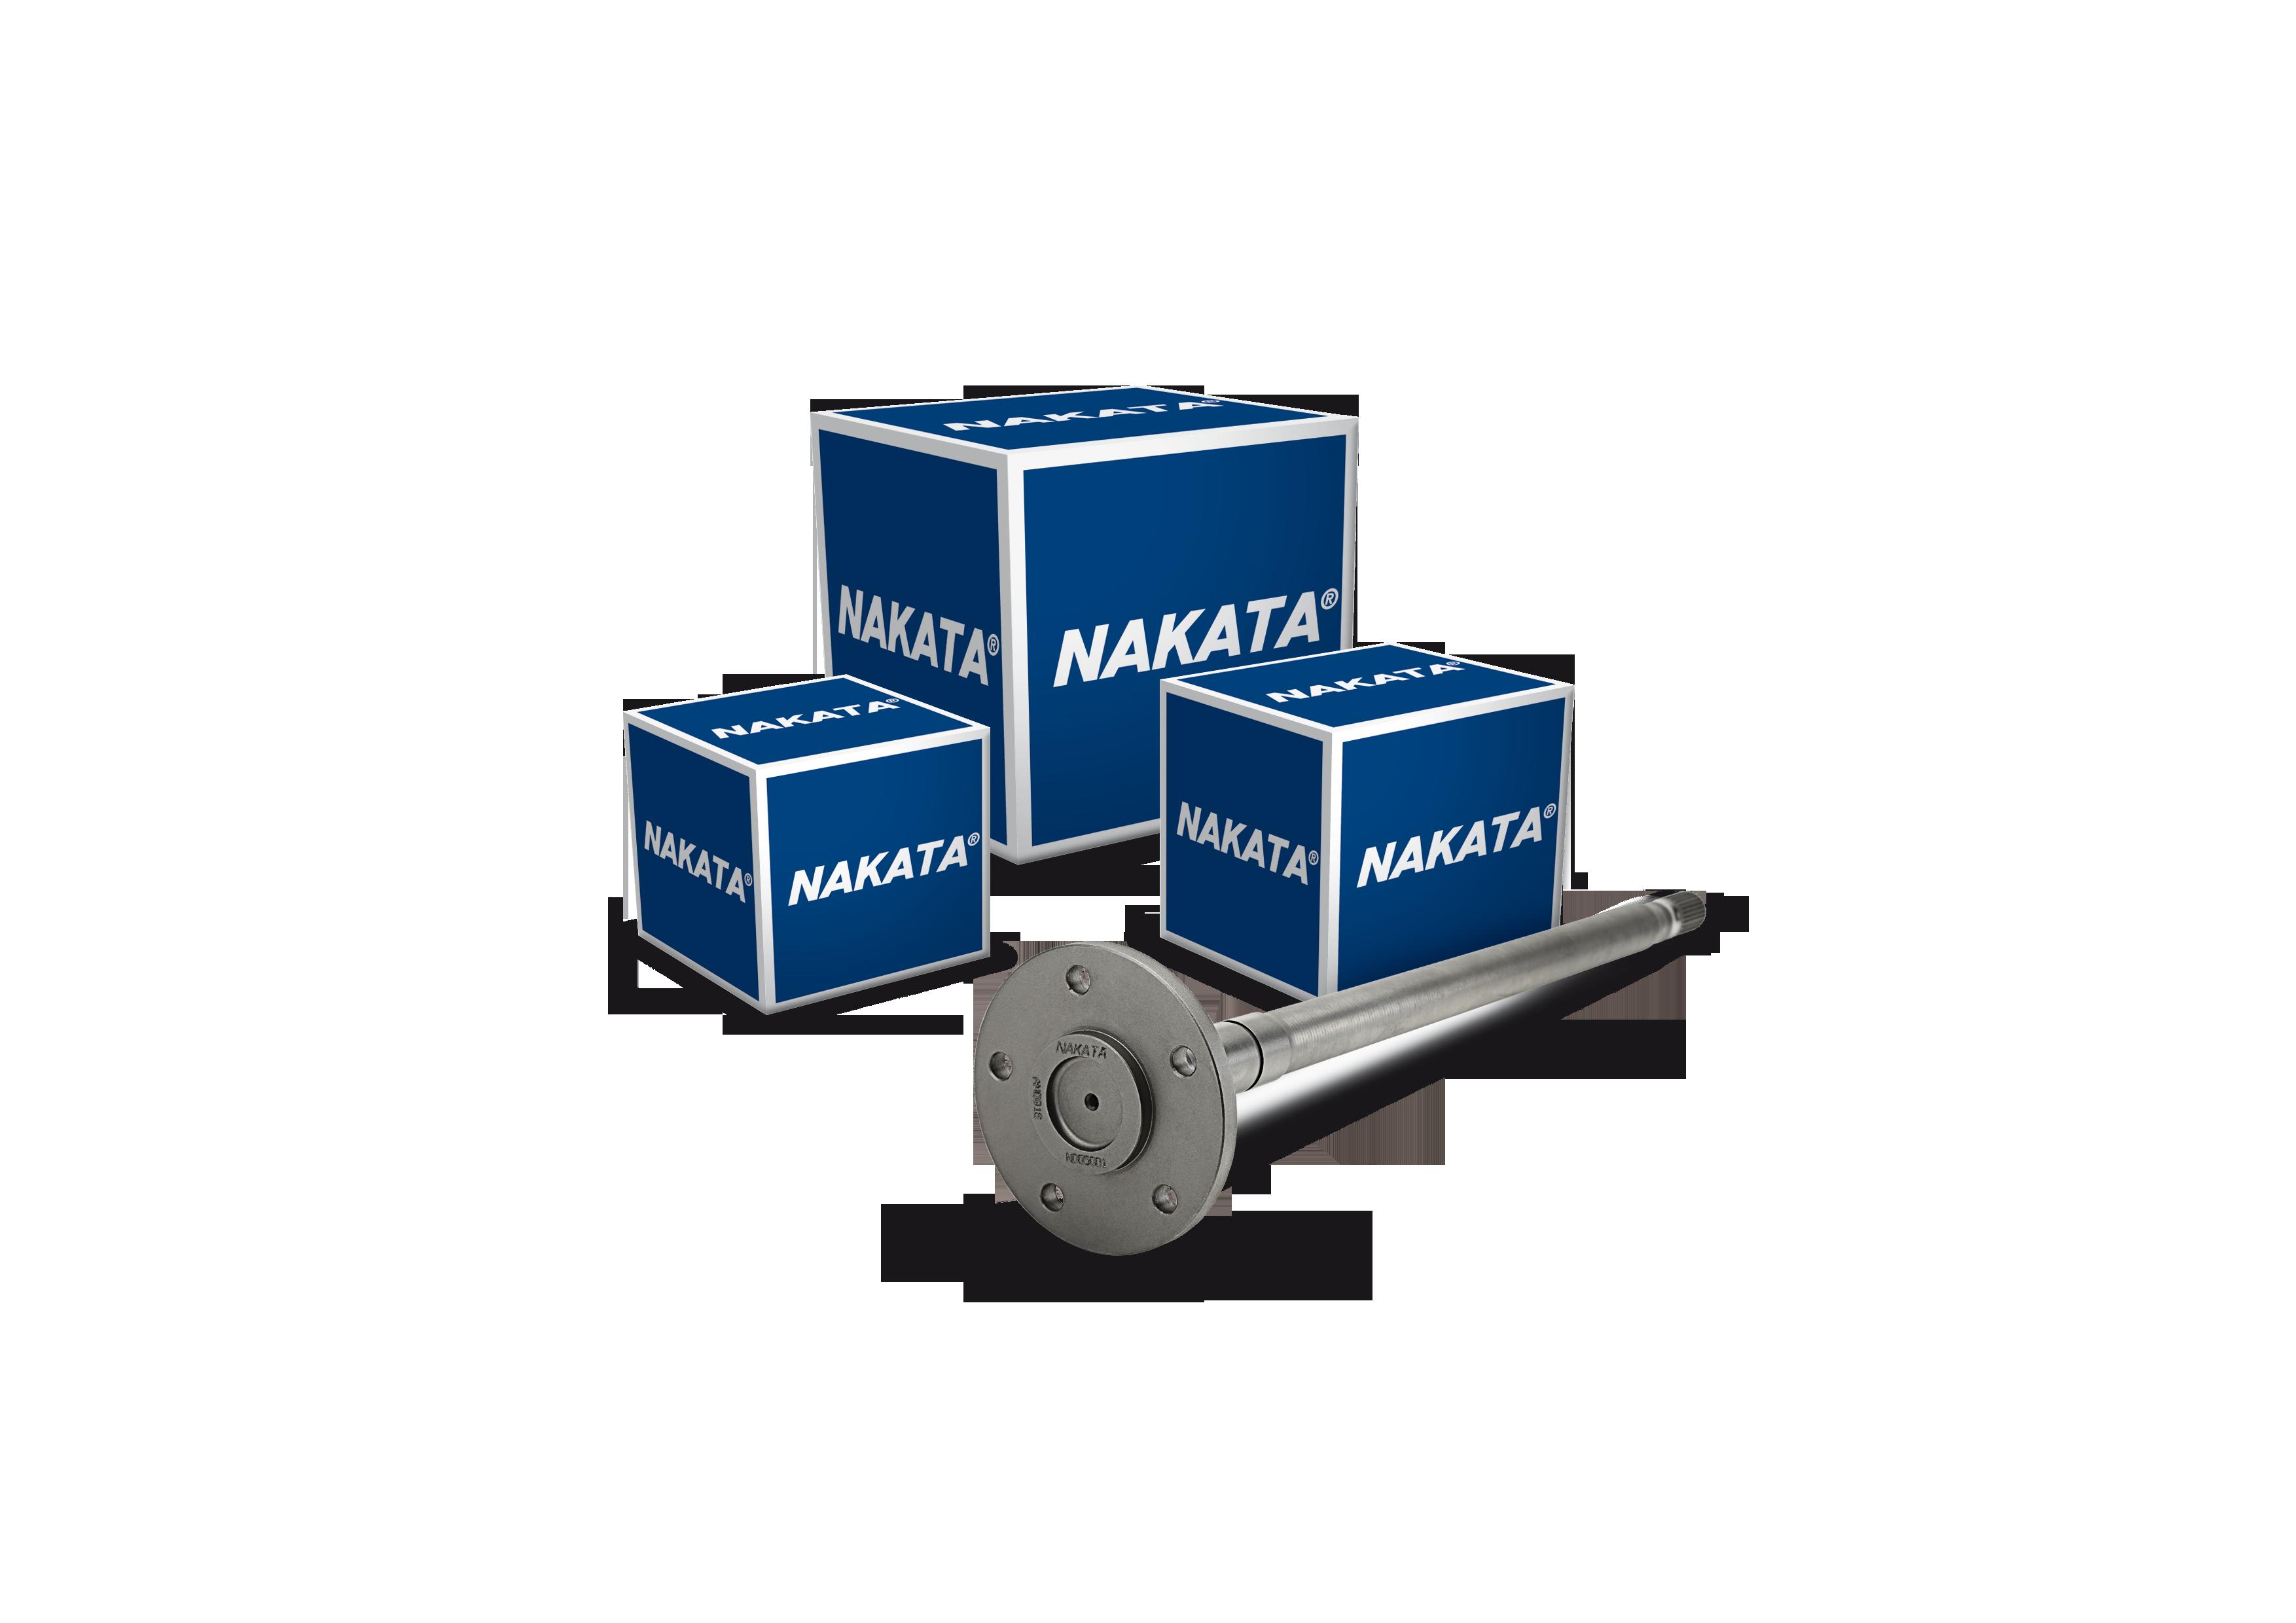 Nakata lança semieixos do diferencial para comerciais leves